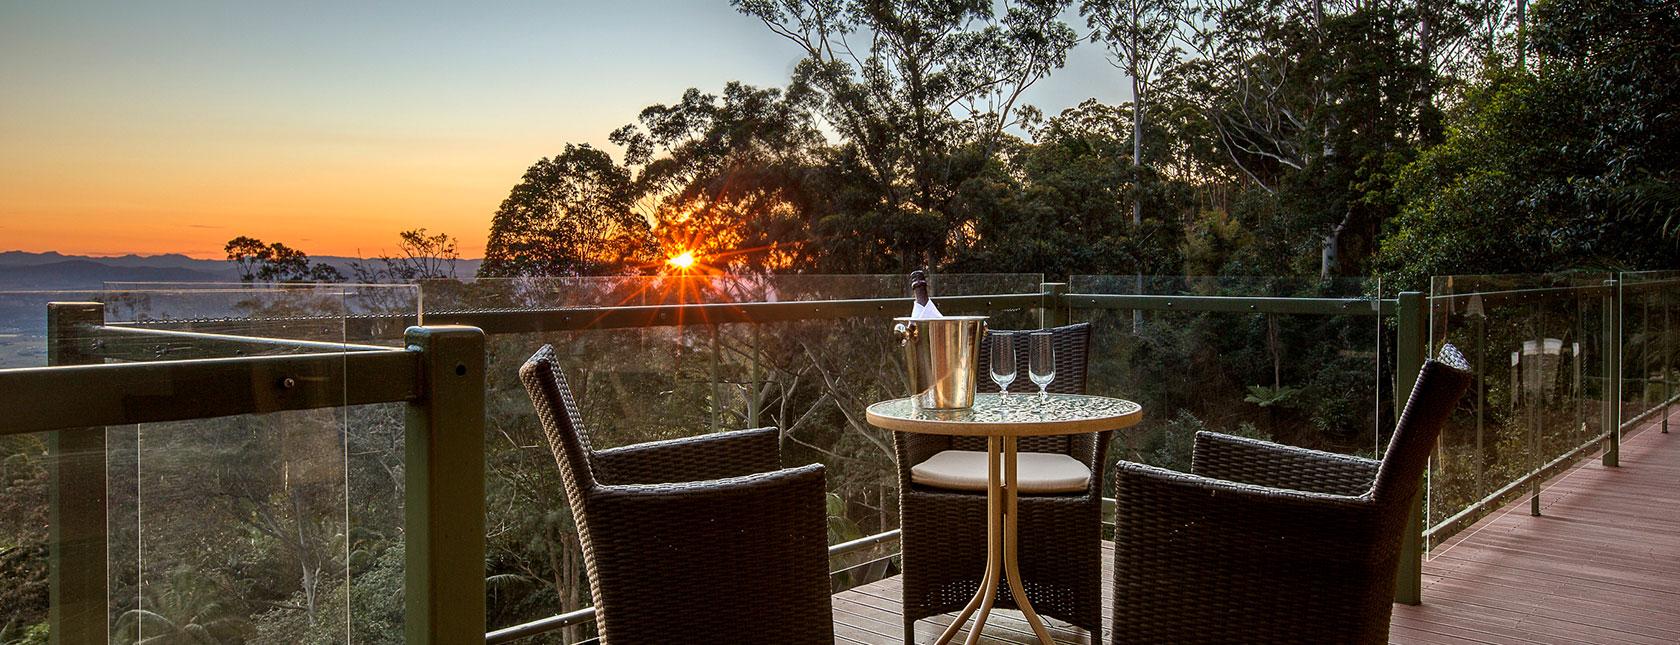 avocado-sunset-accommodation-tamborine-mountain